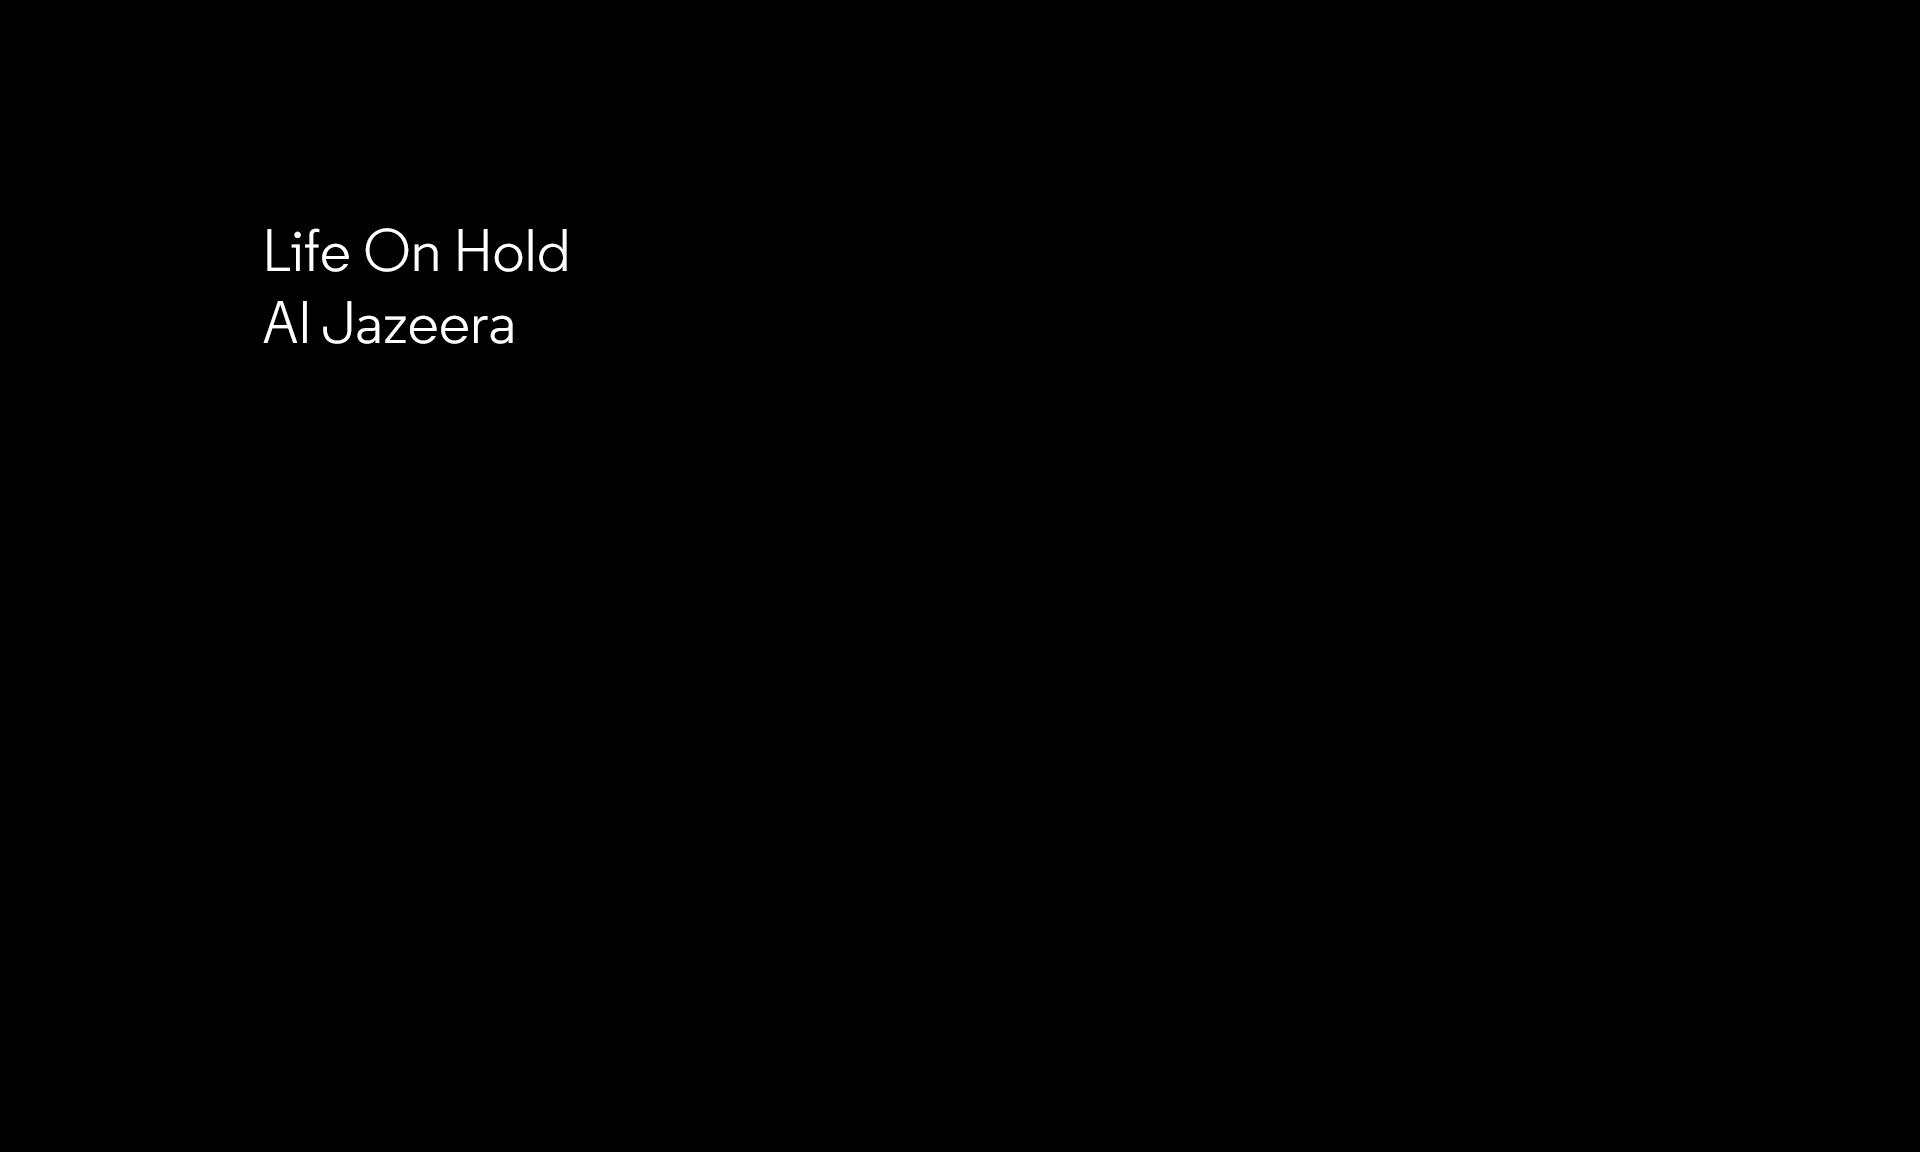 Life-On-Hold_01.jpg